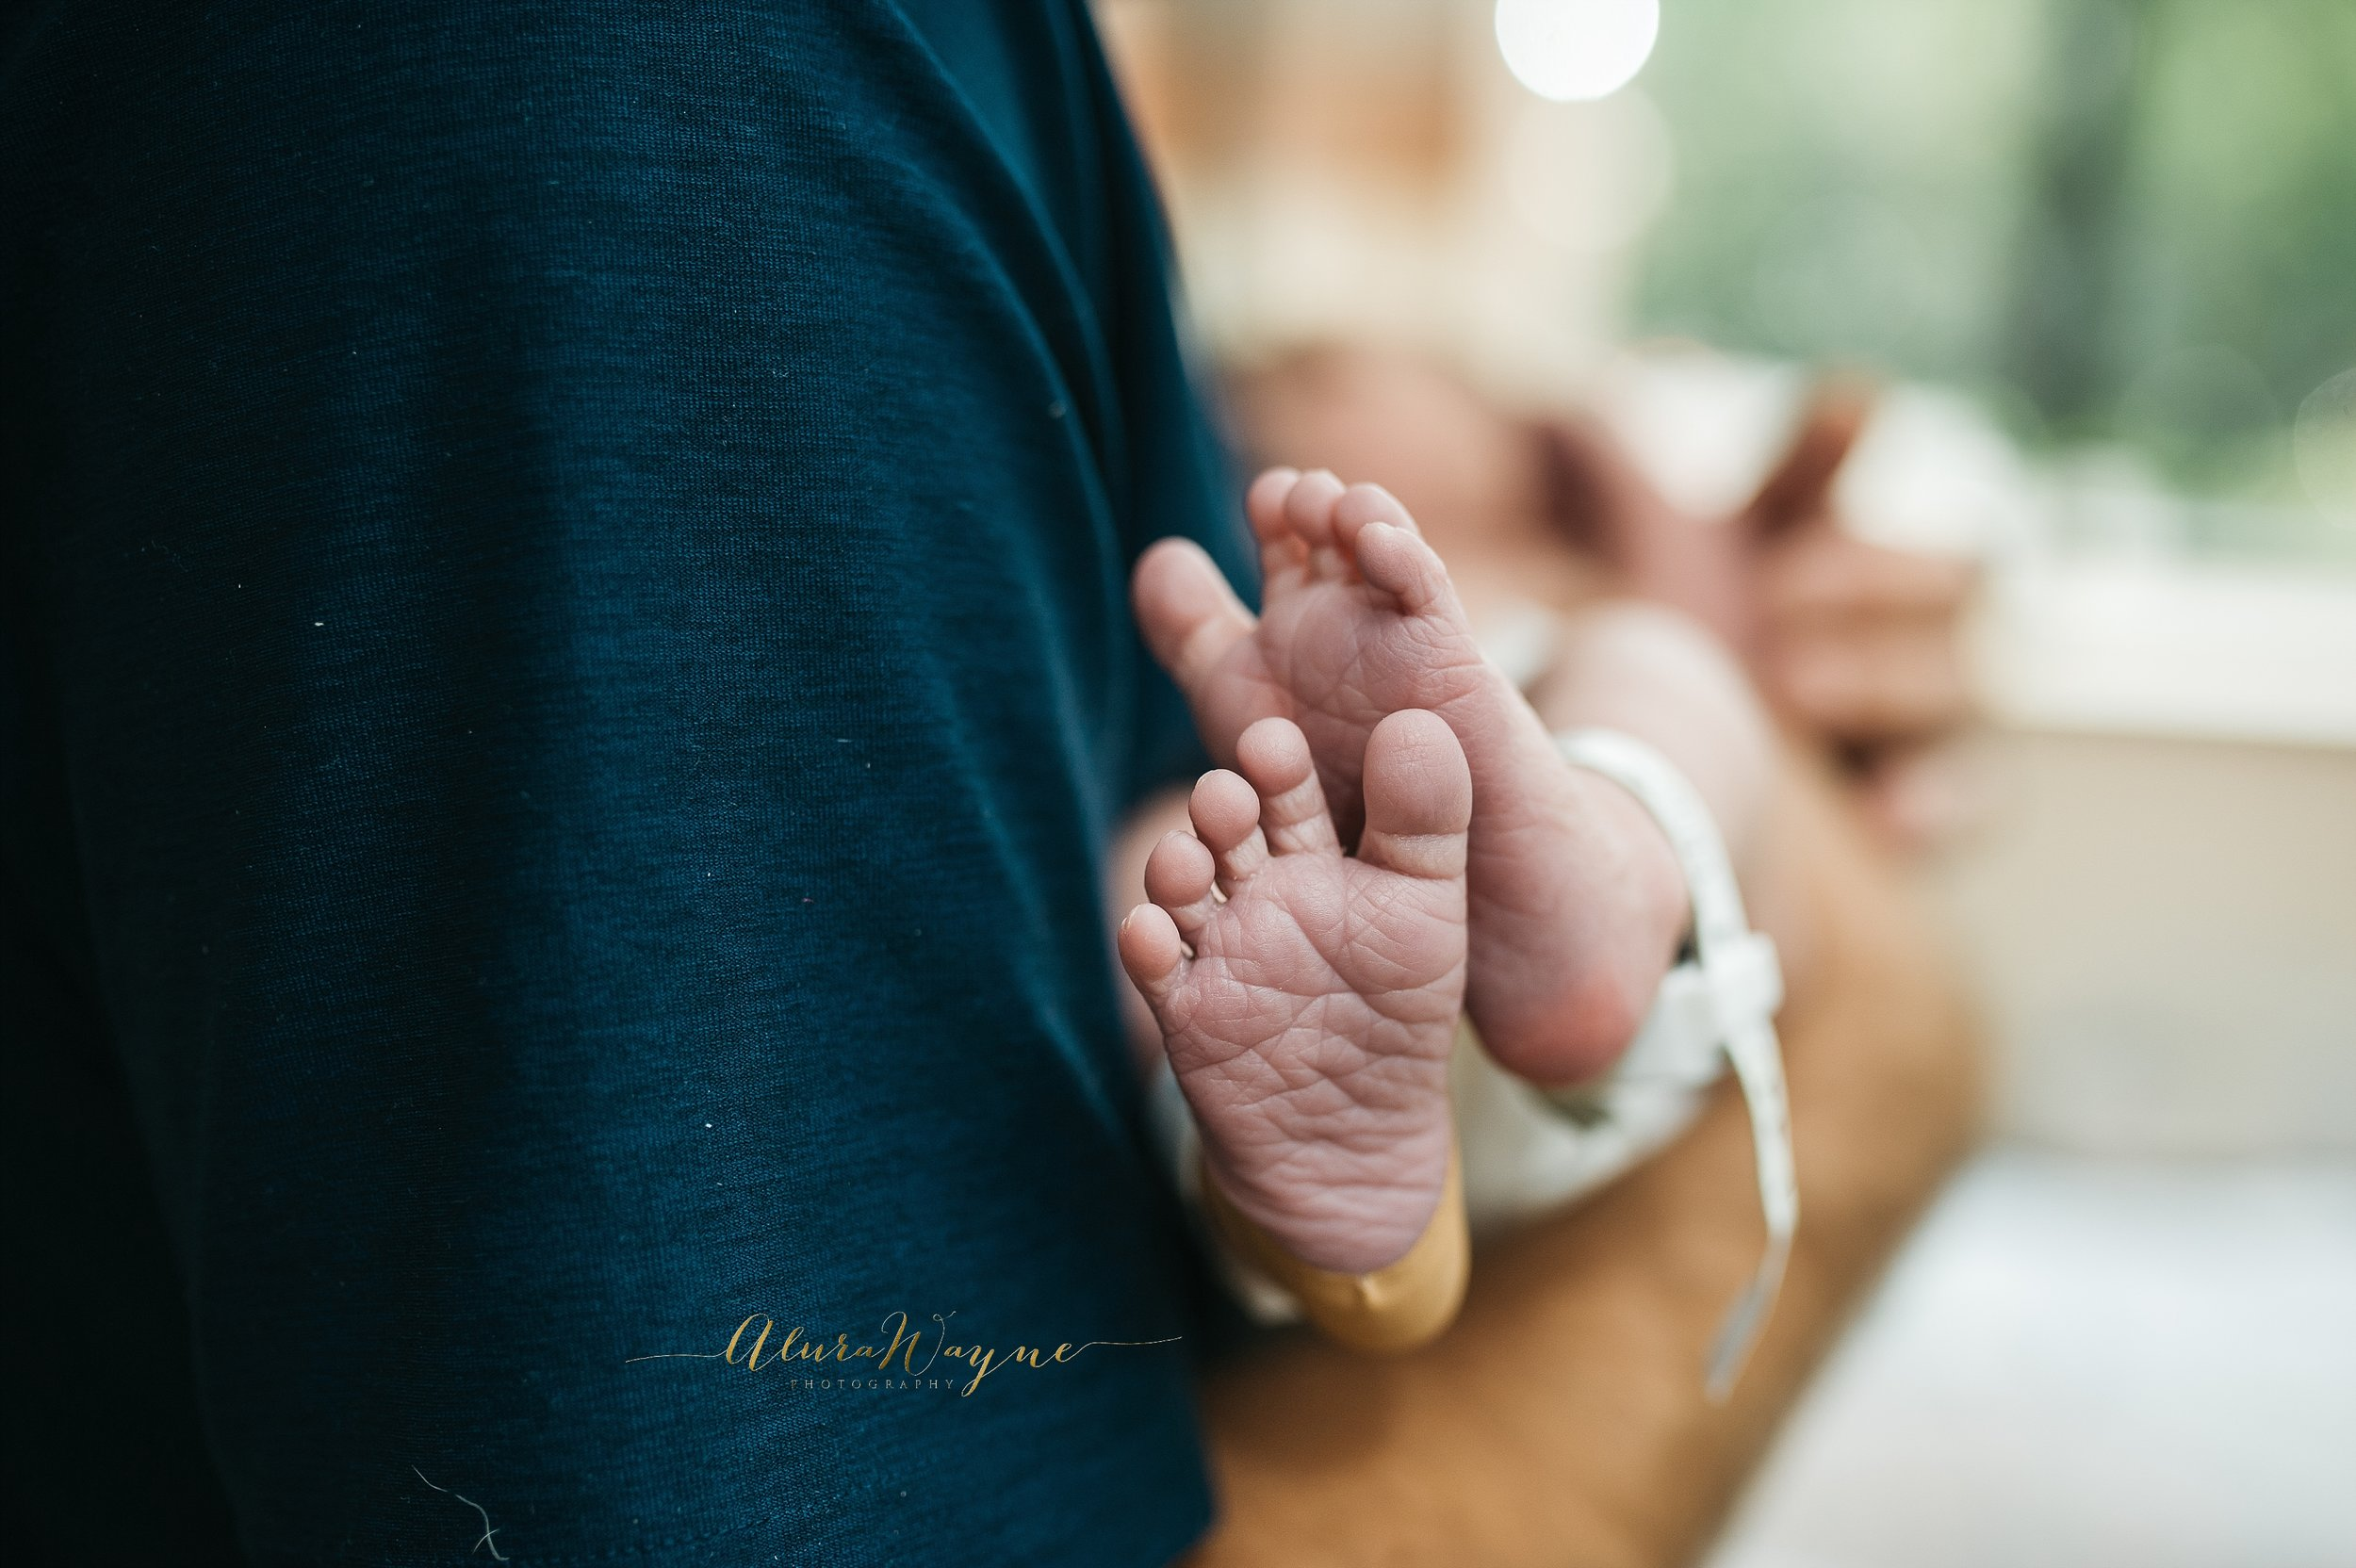 nashville newborn photographers | nashville fresh 48 photographers | alurawayne photography